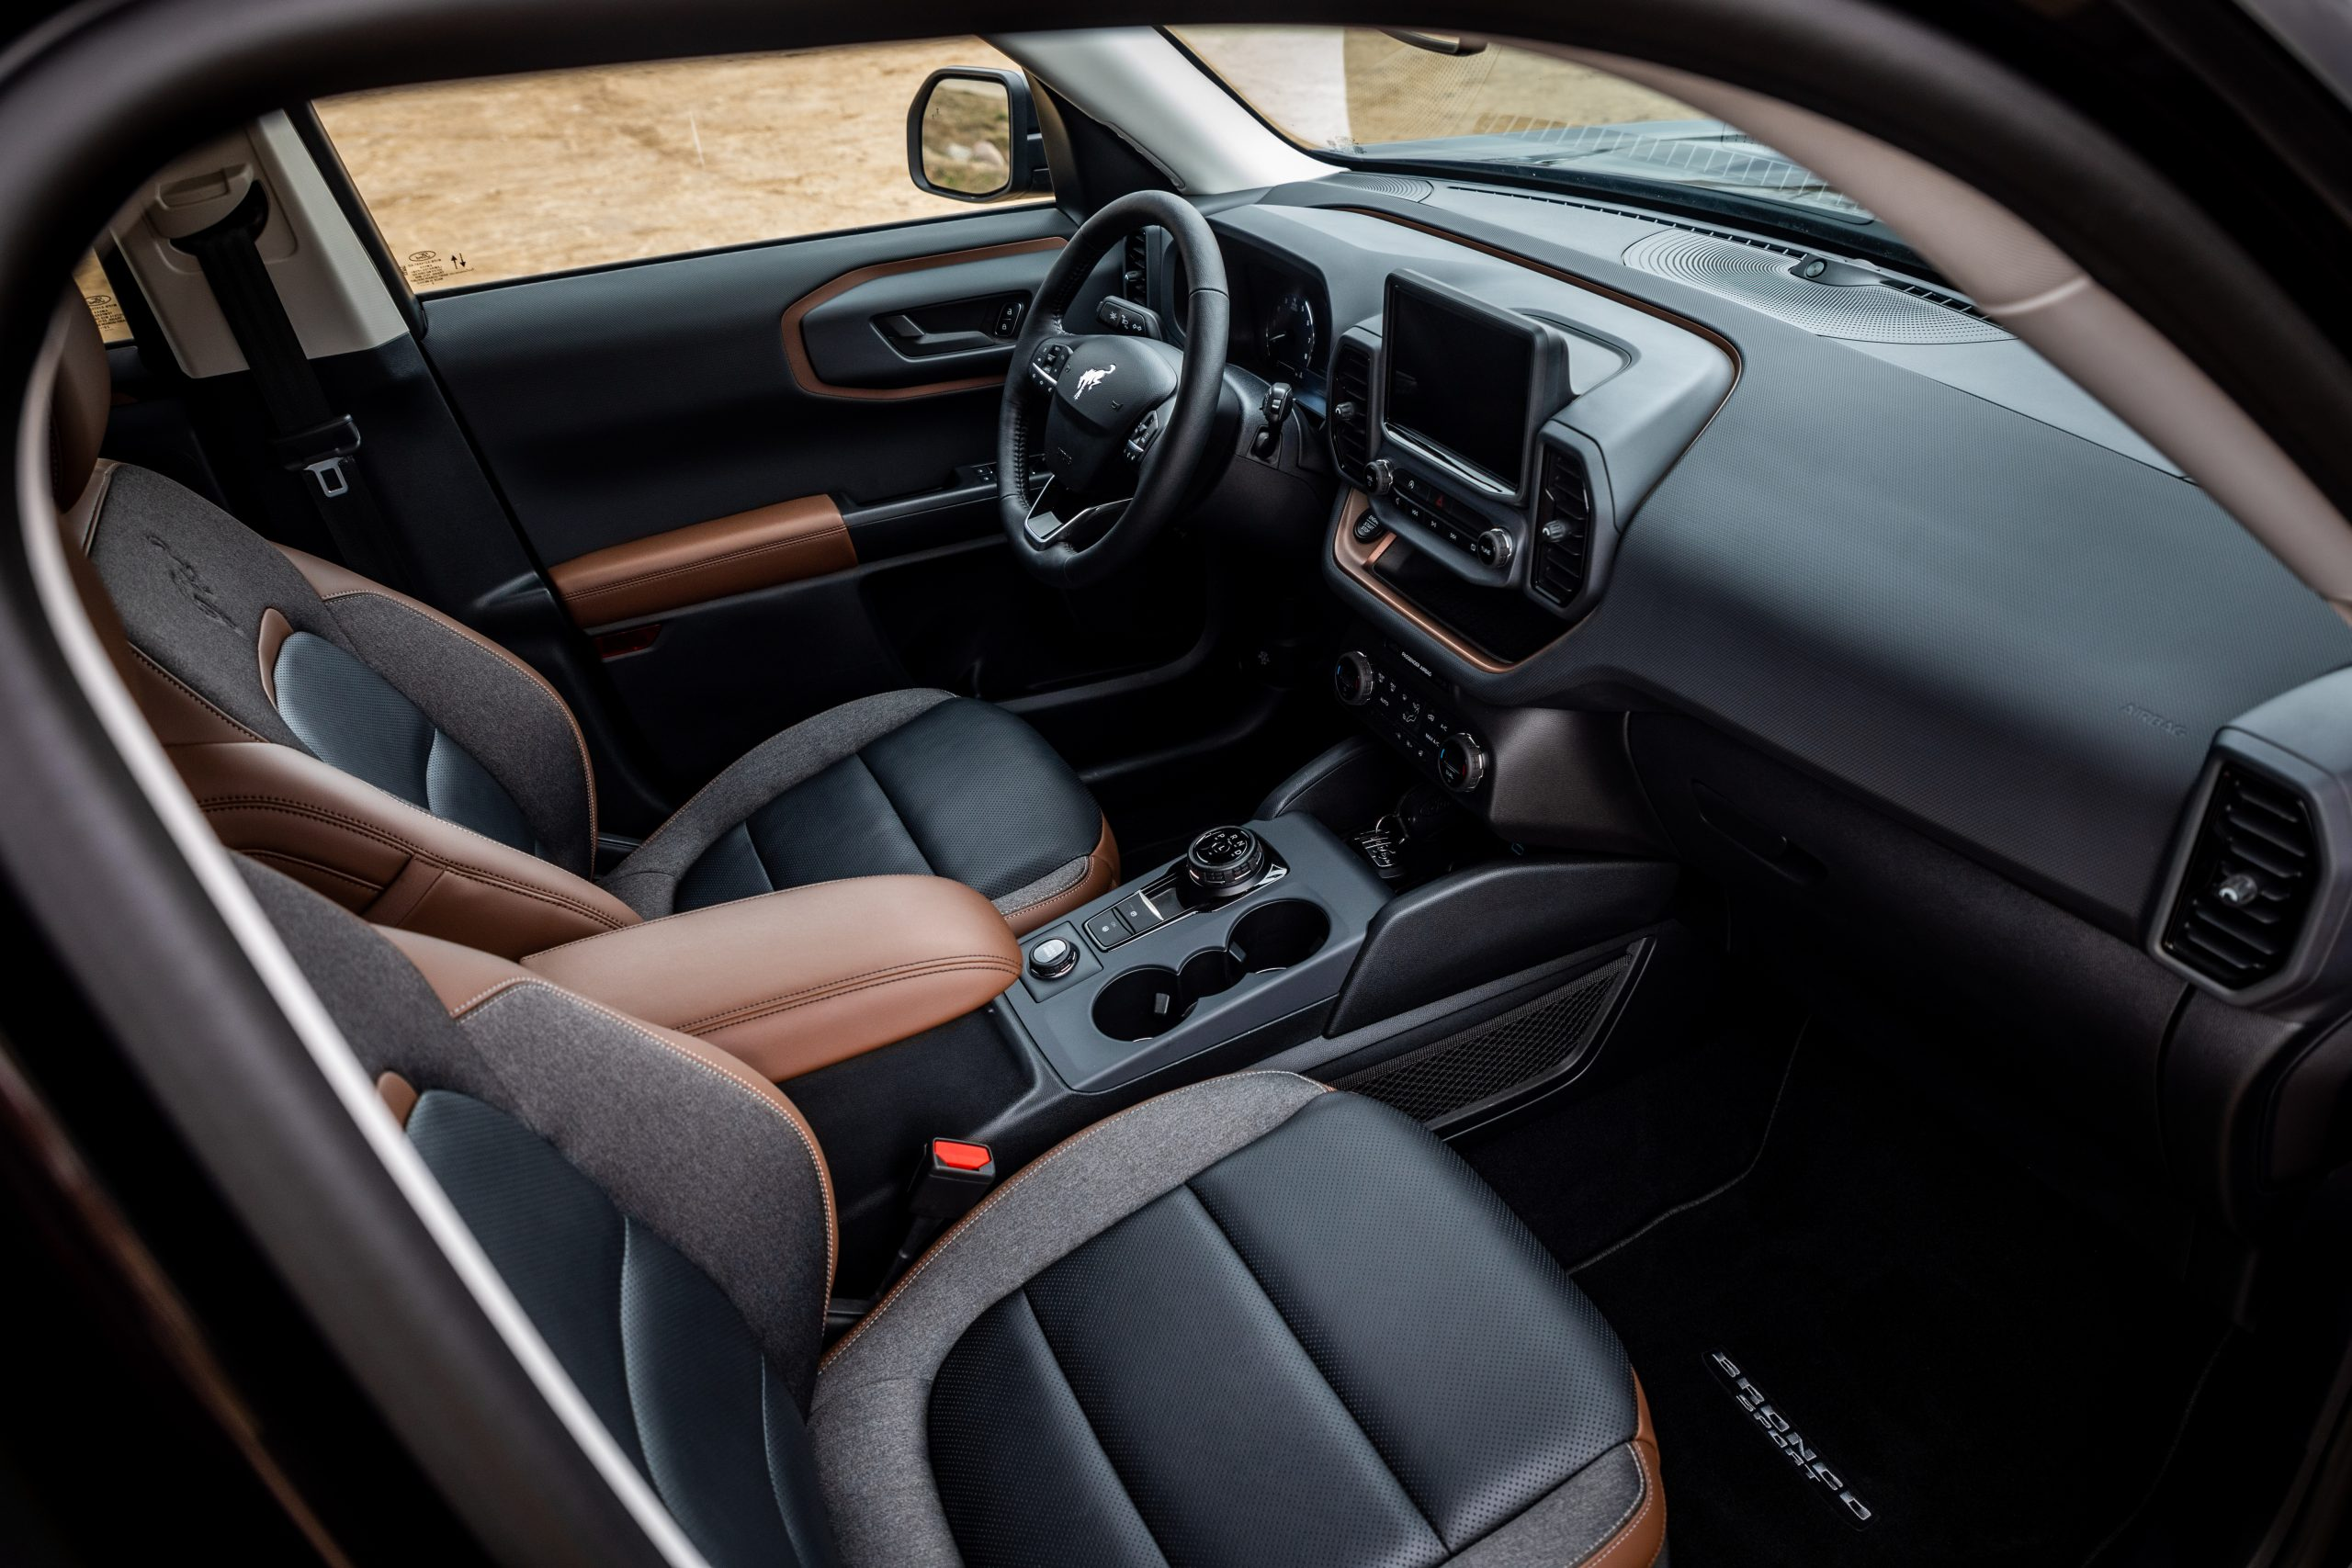 2021 Bronco Sport interior from passenger side